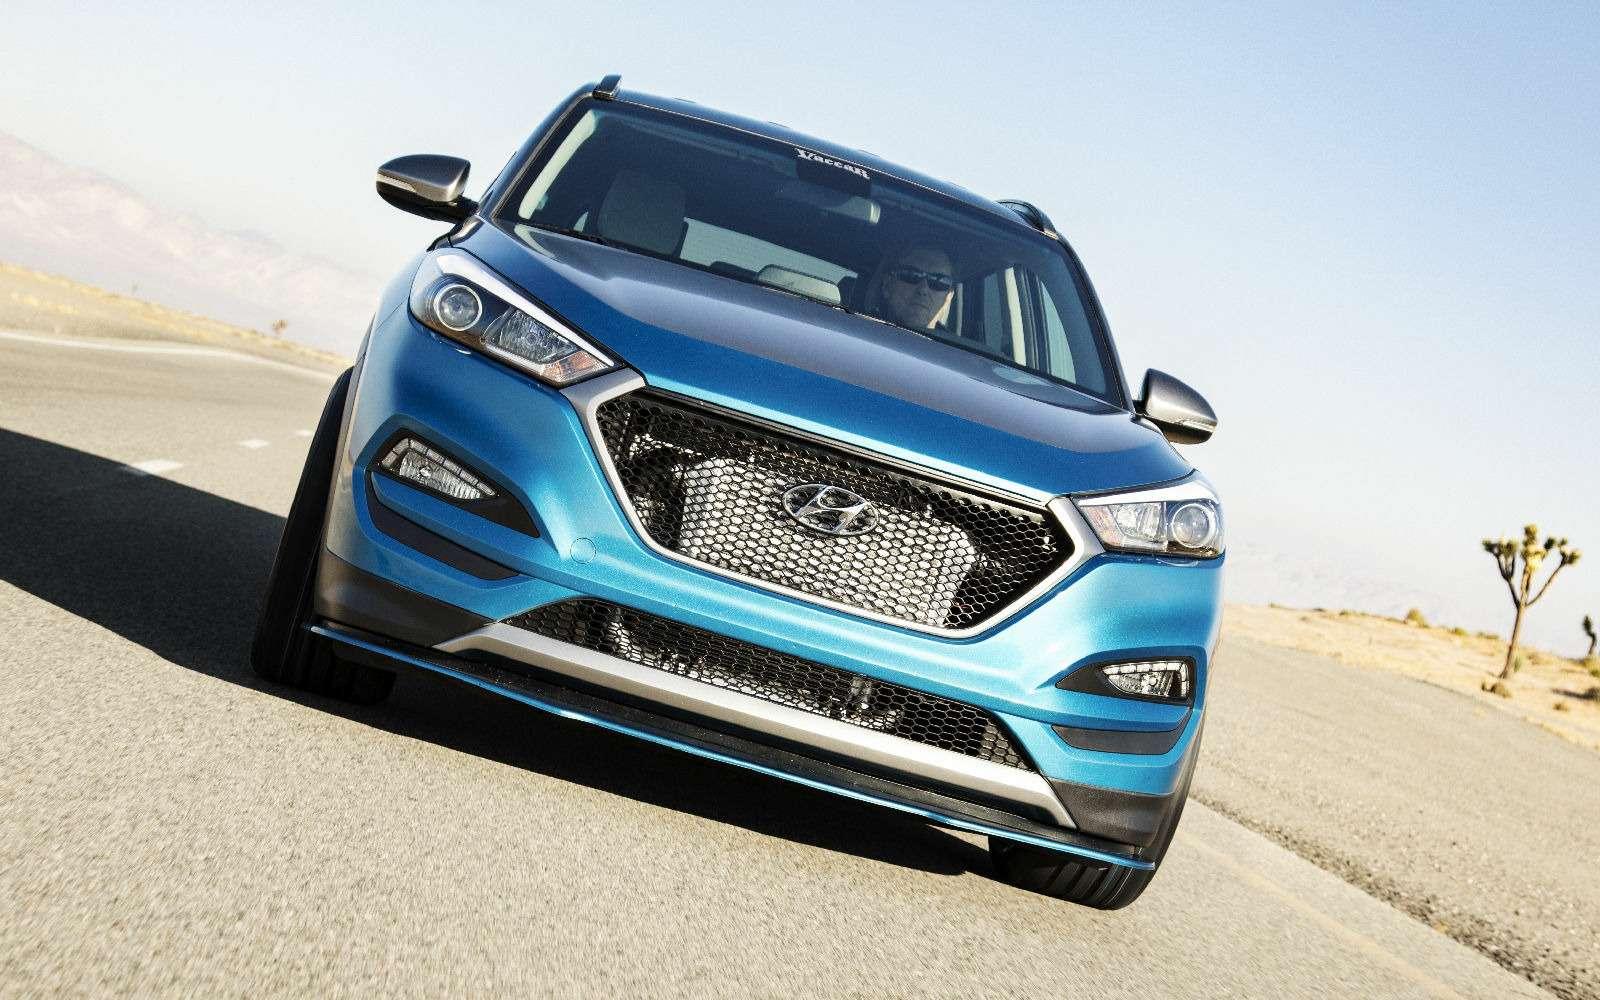 Тюнинг-шоу вЛас-Вегасе— крутые экспонаты Hyundai— фото 812001